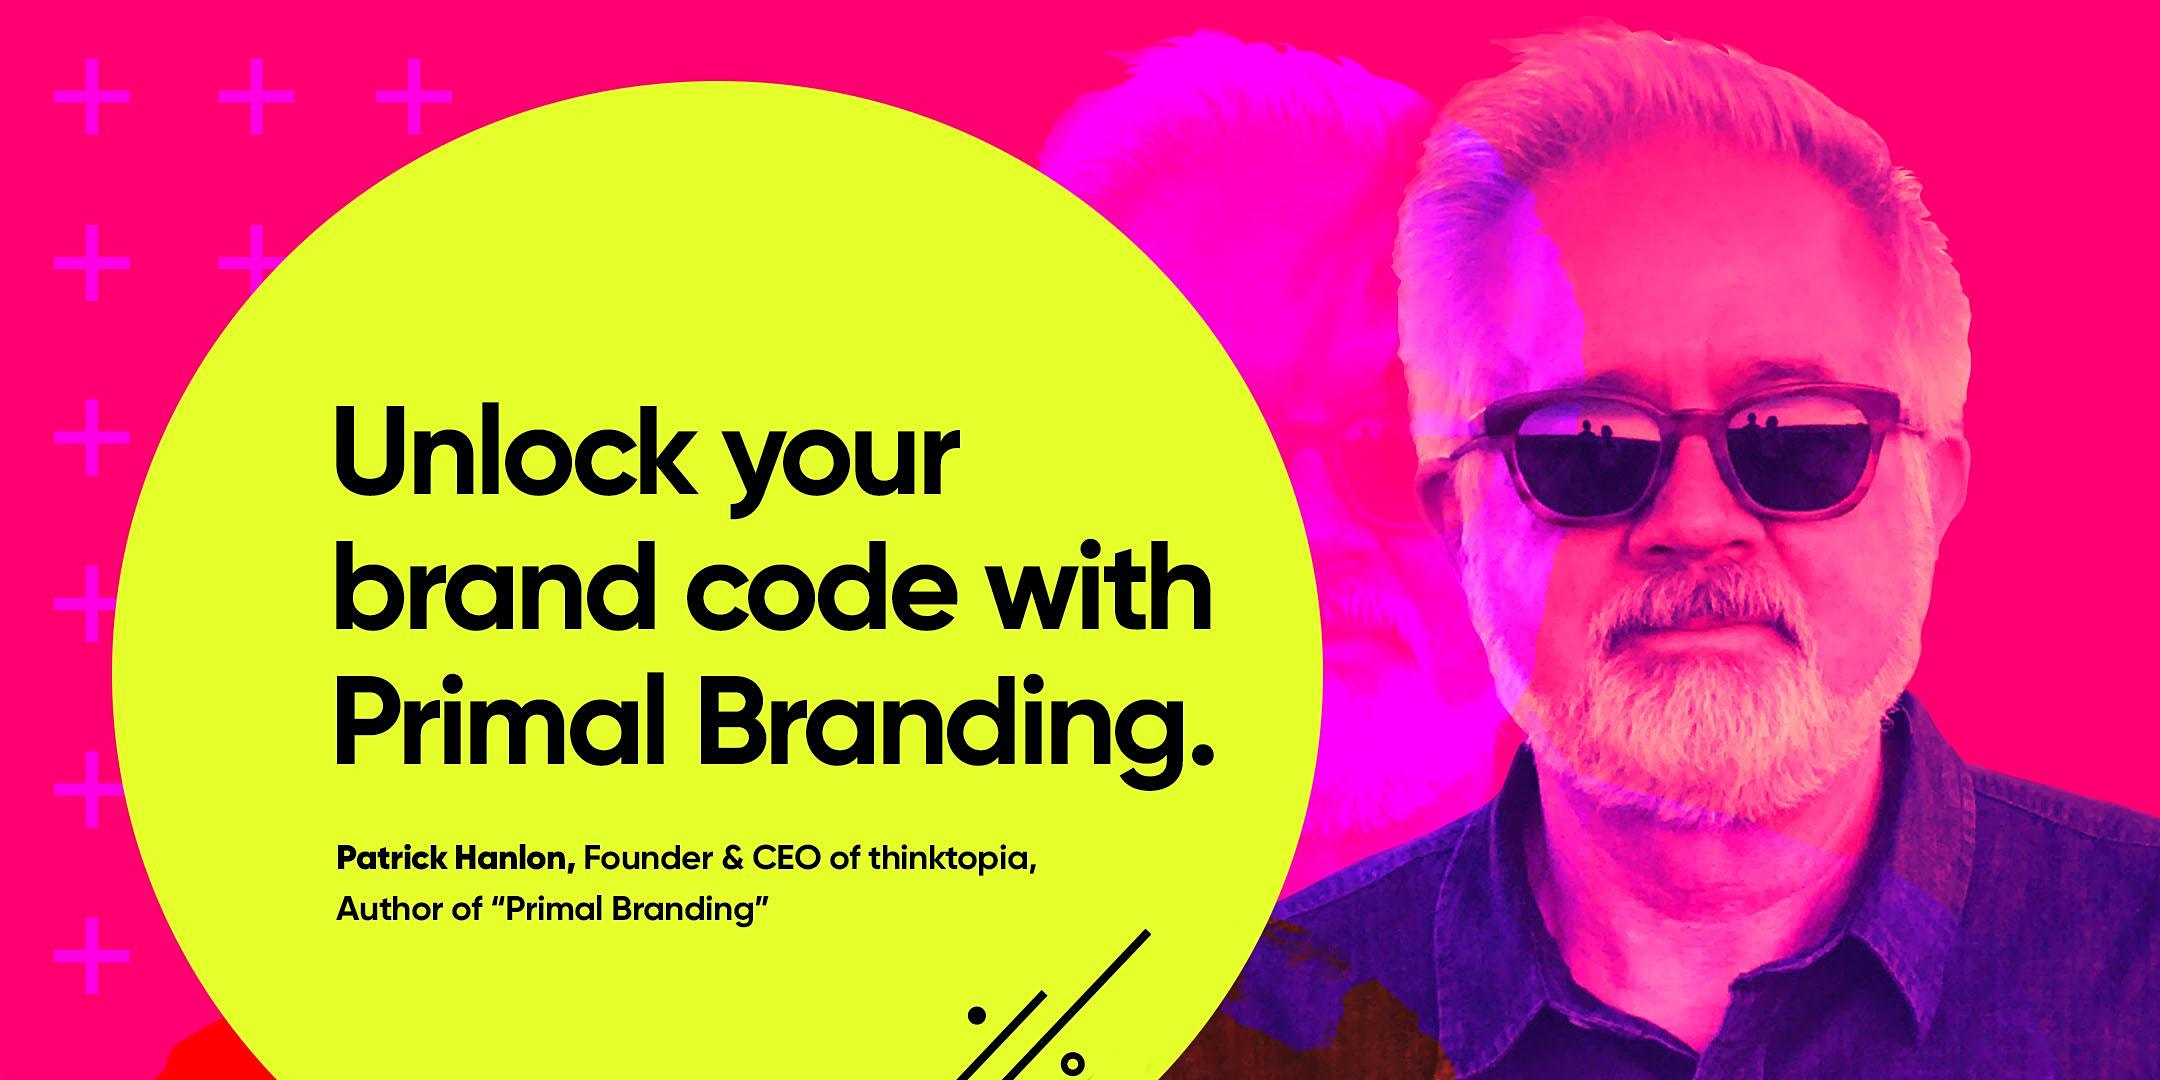 Unlock Your Brand Code with Primal Branding